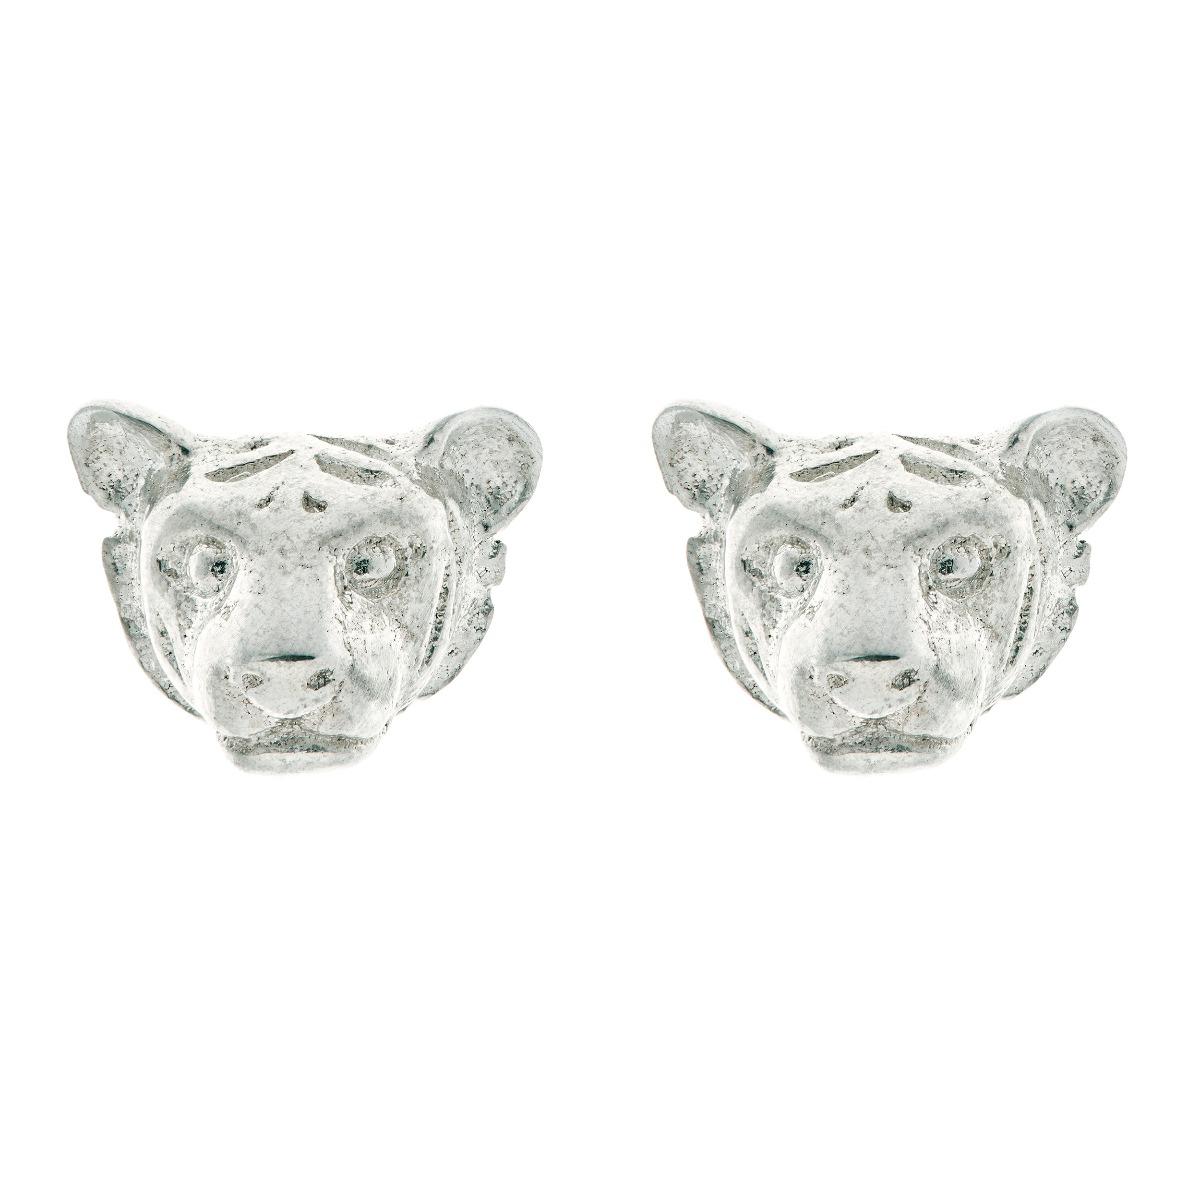 Chinese zodiac stud earrings (tiger)